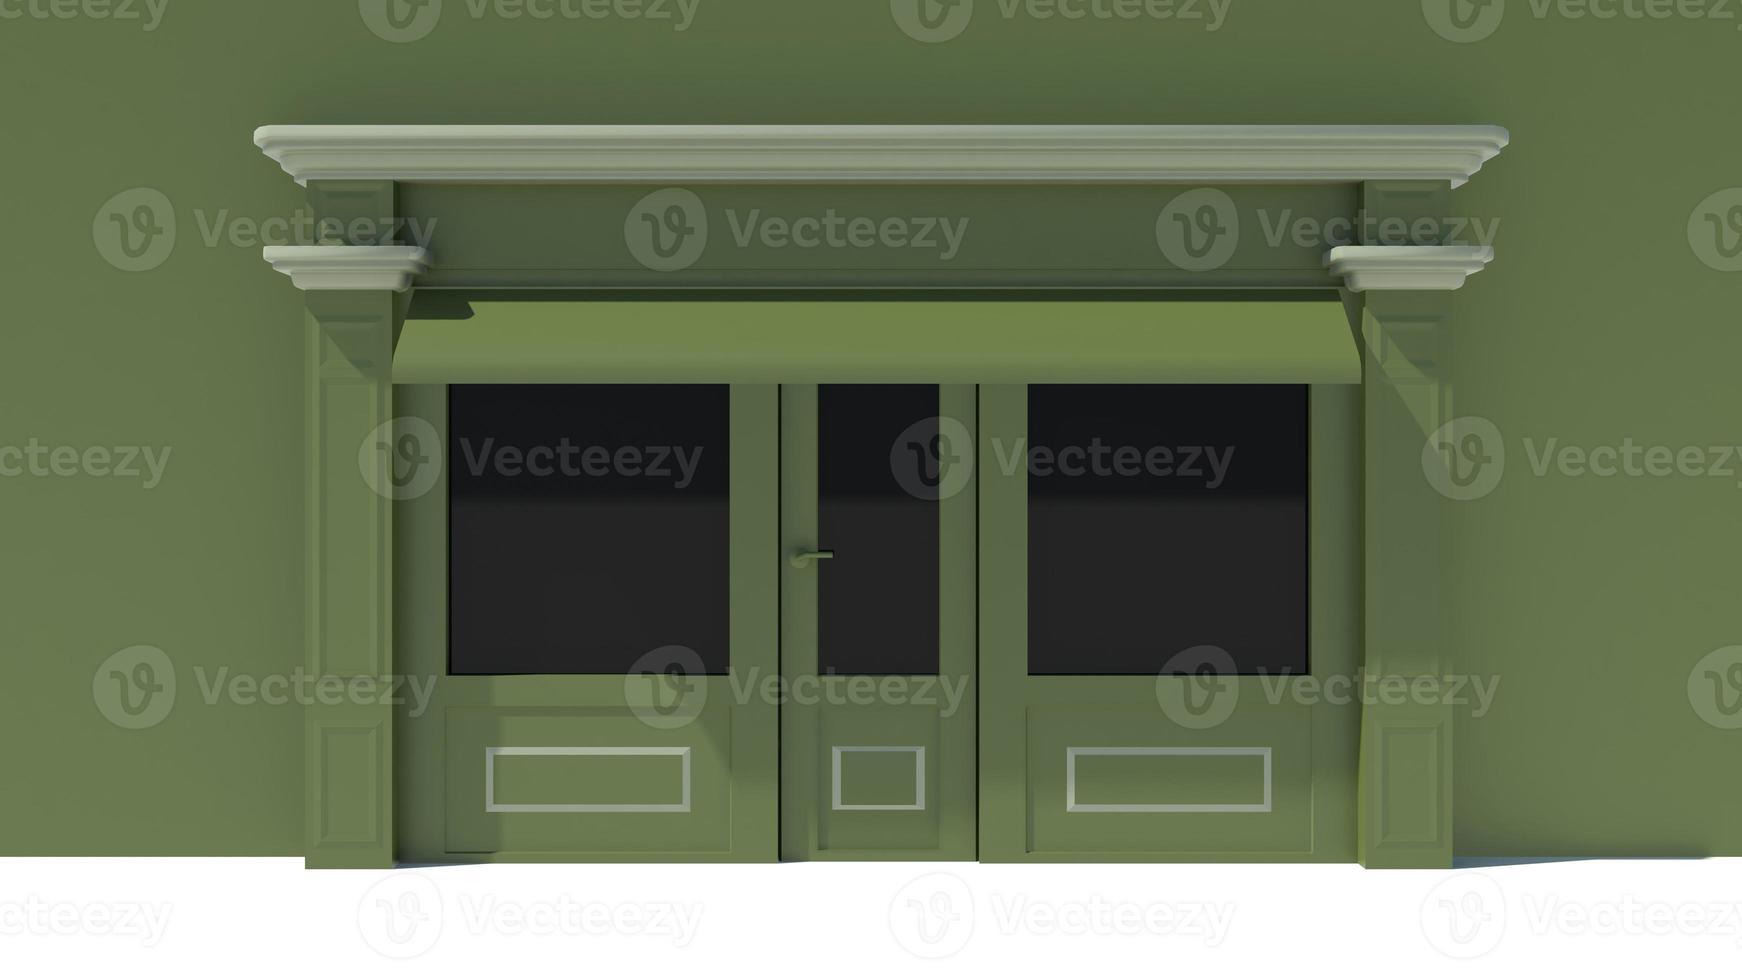 zonnig winkelpui met grote raampartijen met witte en groene winkelgevel foto